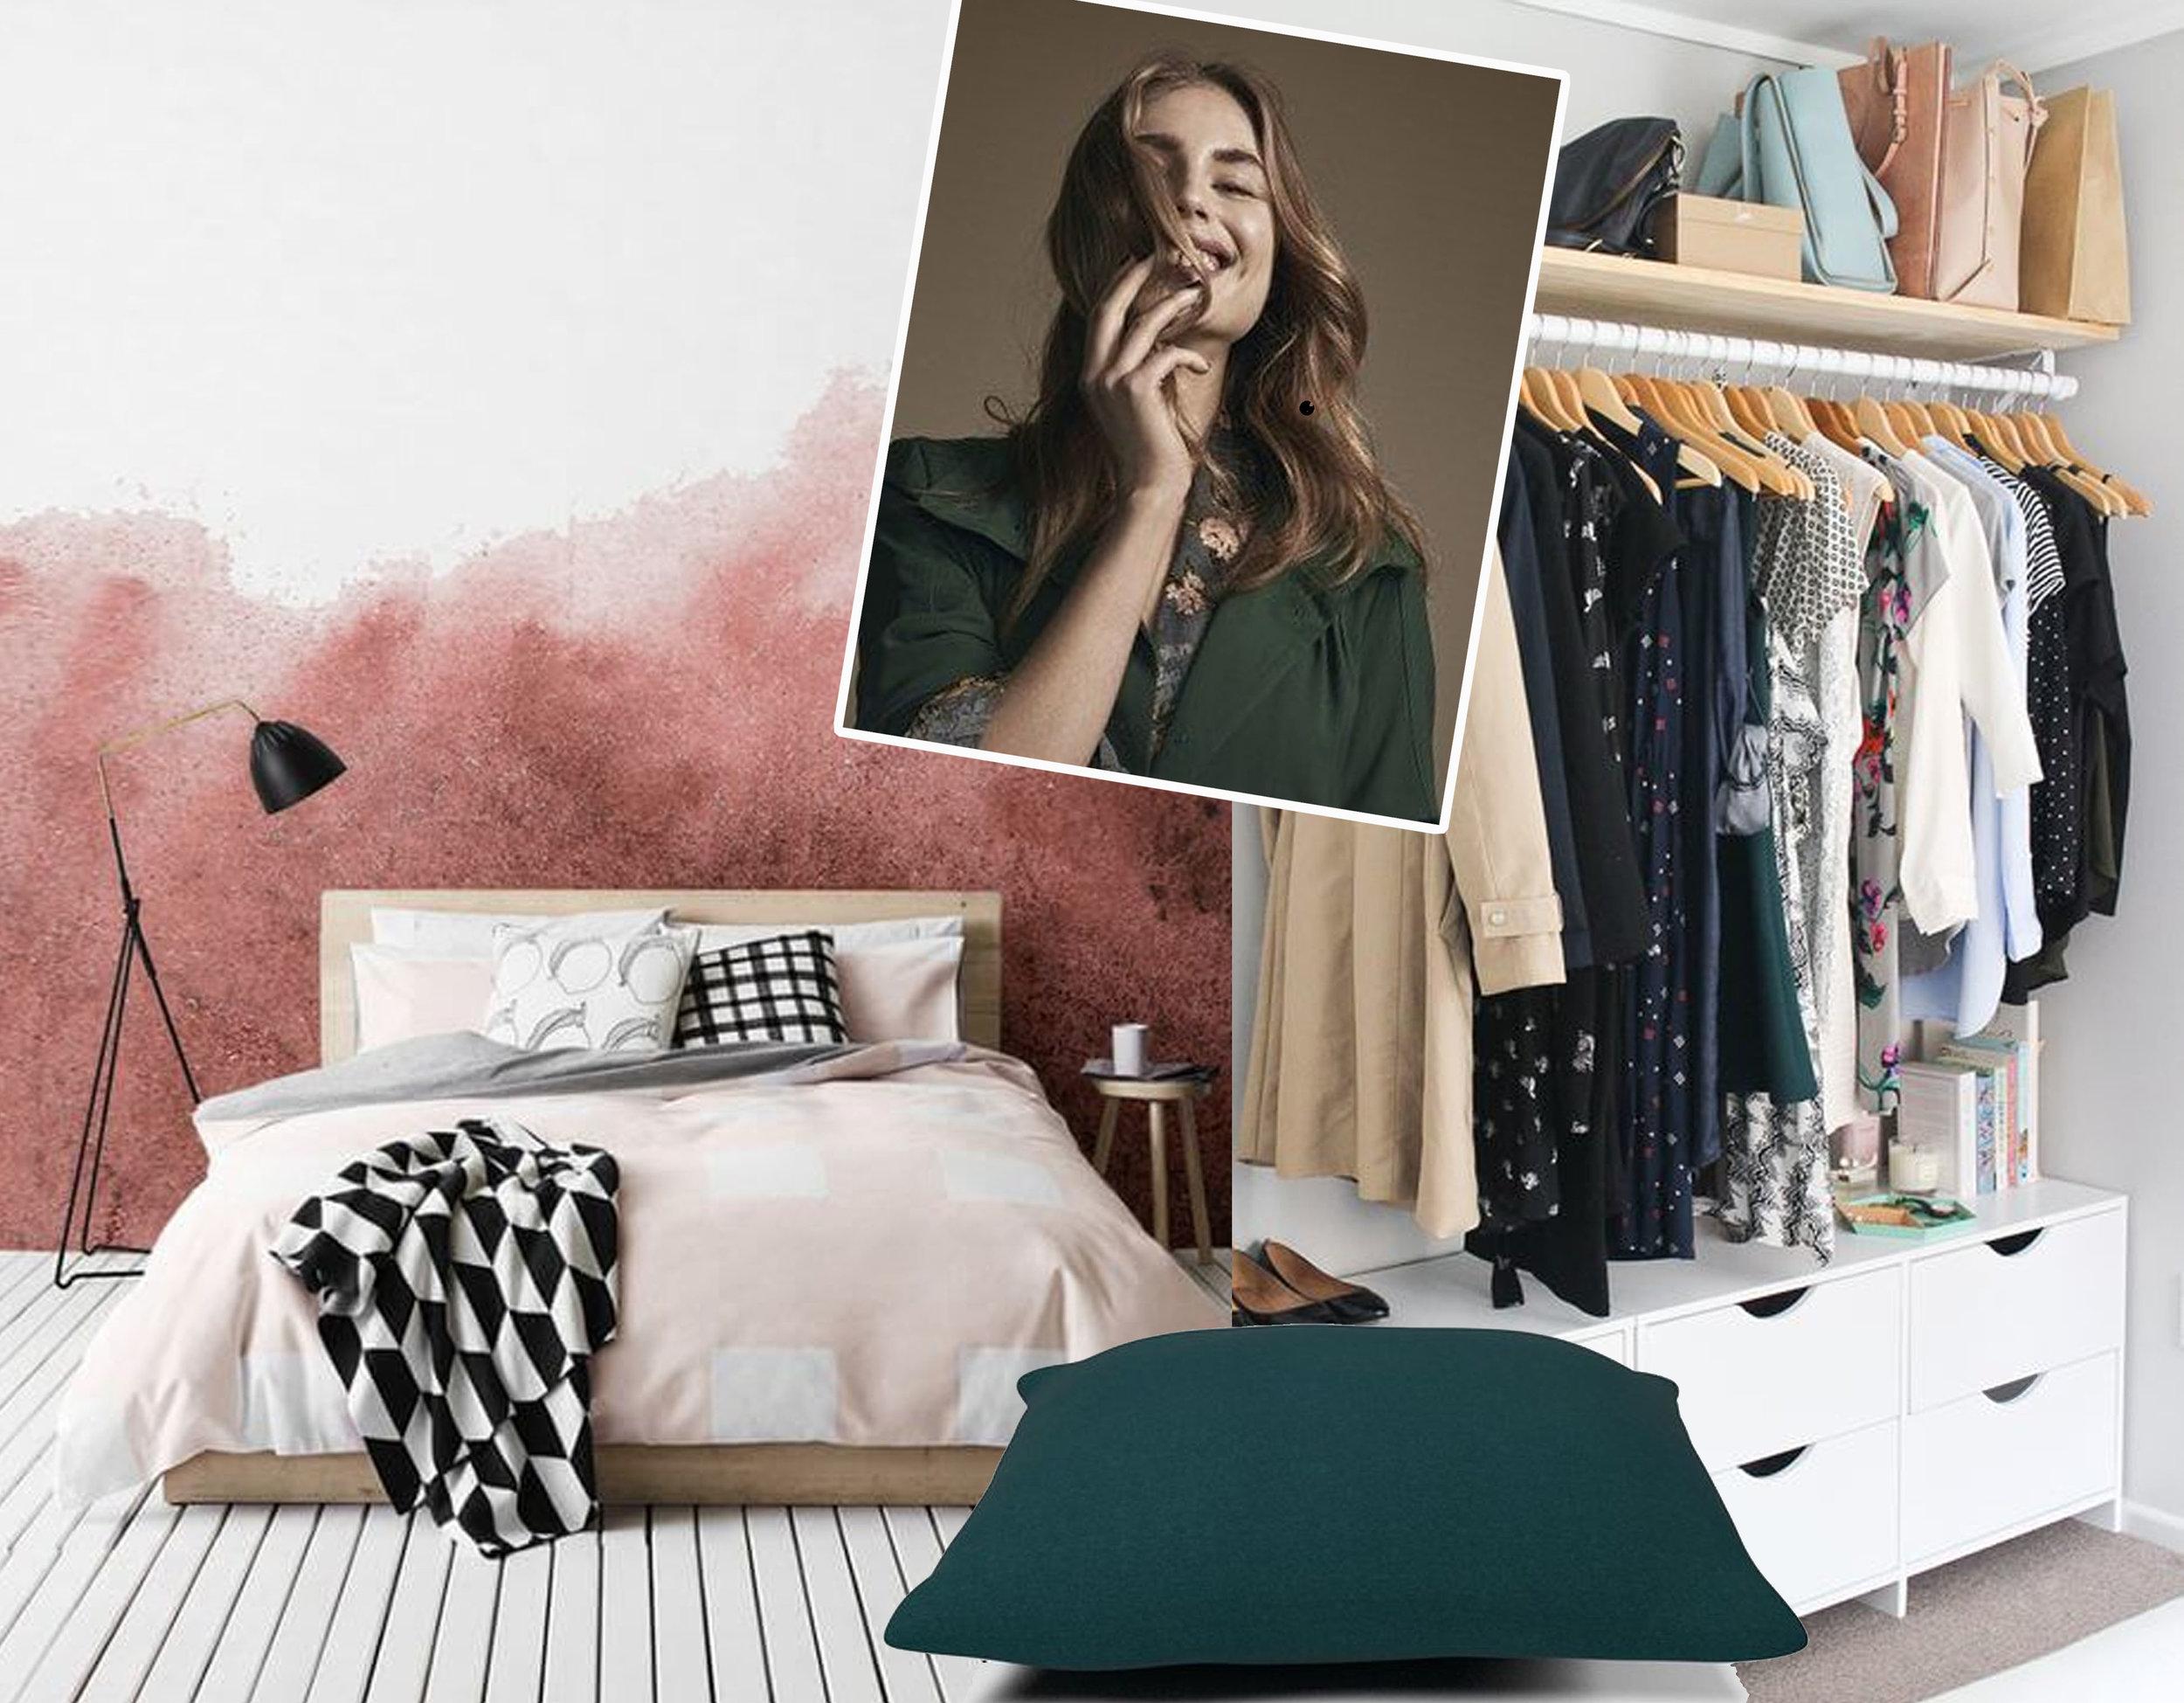 watercolor wallpaper  Mural Wallpapers  - dressing image via  Master Bedroom Ideas - mega floor cushion  Bolia  - woman's image via  Bolia